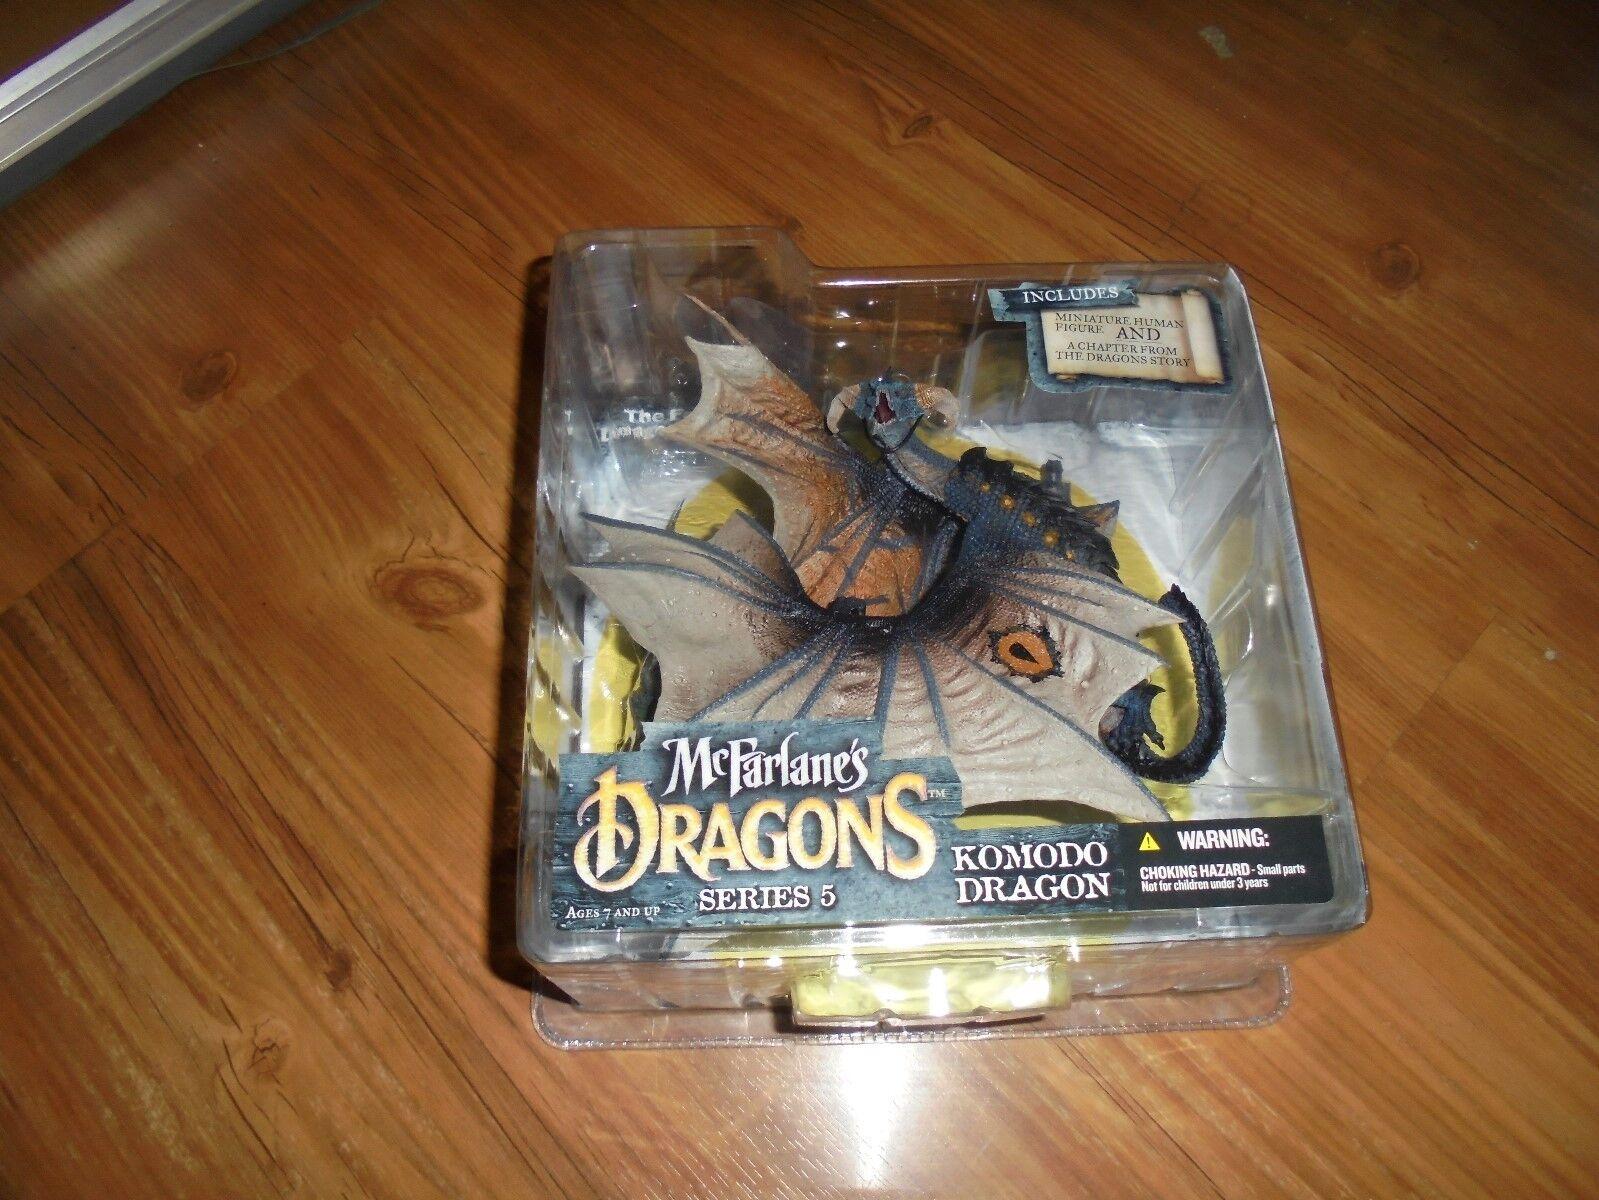 McFarlane's Dragons The Fall Of The Dragon Dragon Dragon Kingdom Series5  KOMODO DRAGON  2006 a8d117